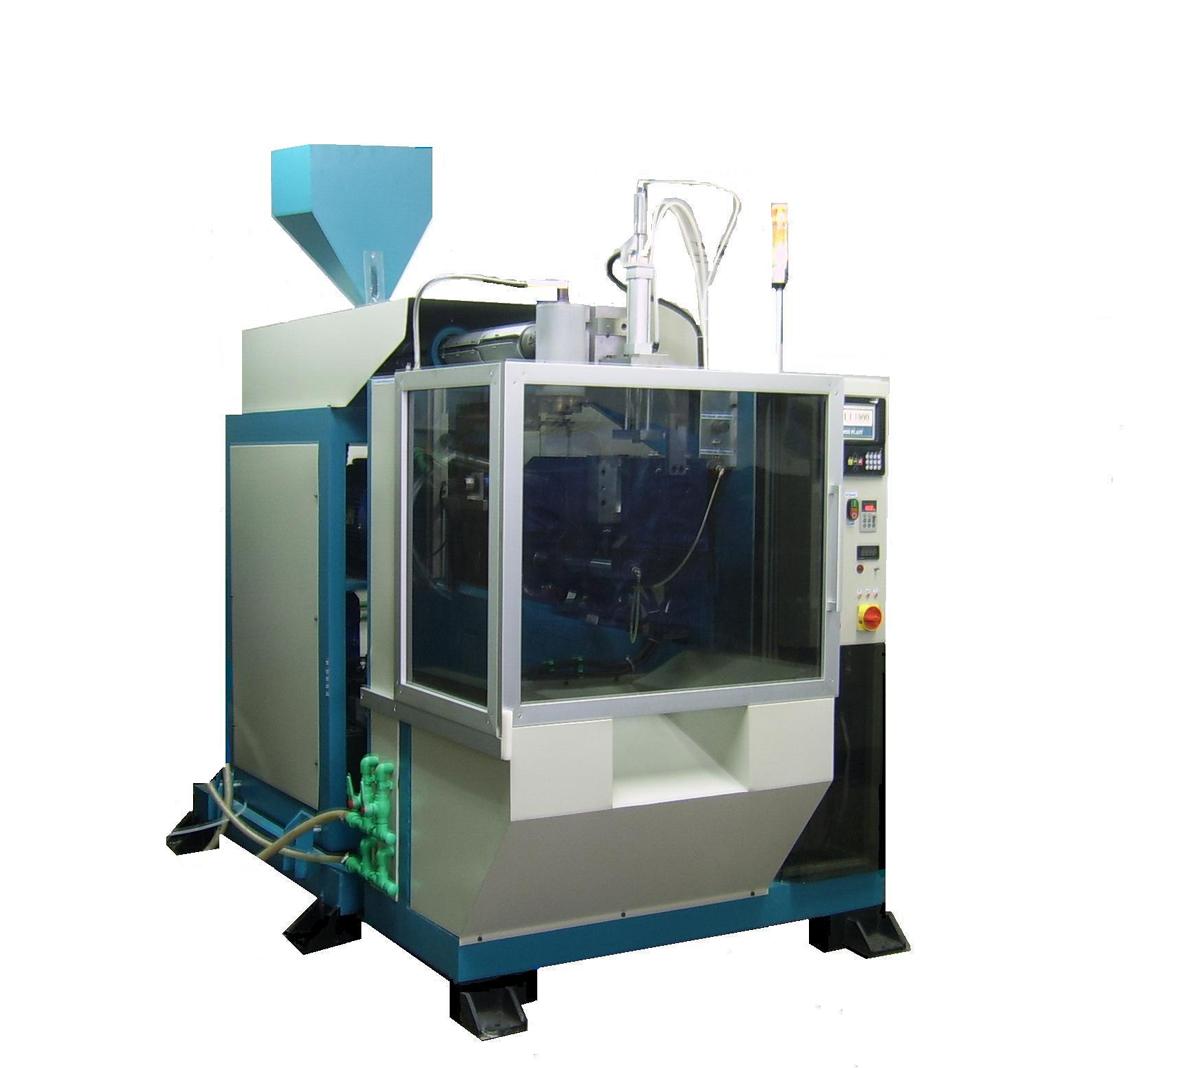 dms plast poly 500 blowmoulding machine